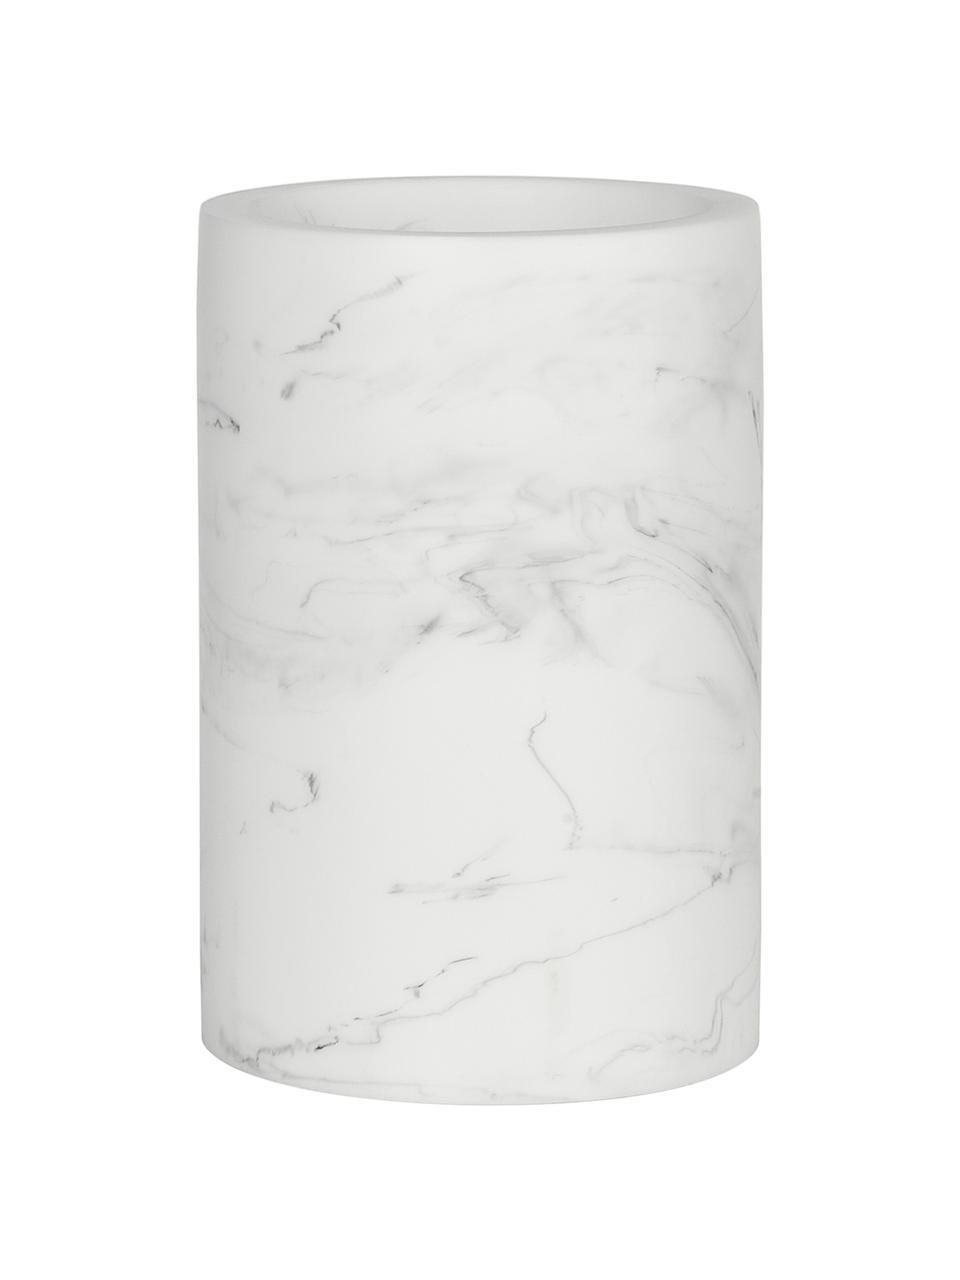 Zahnputzbecher Swan in Marmor-Optik, Kunststoff (Polyresin), Weiß, marmoriert, Ø 7 x H 11 cm